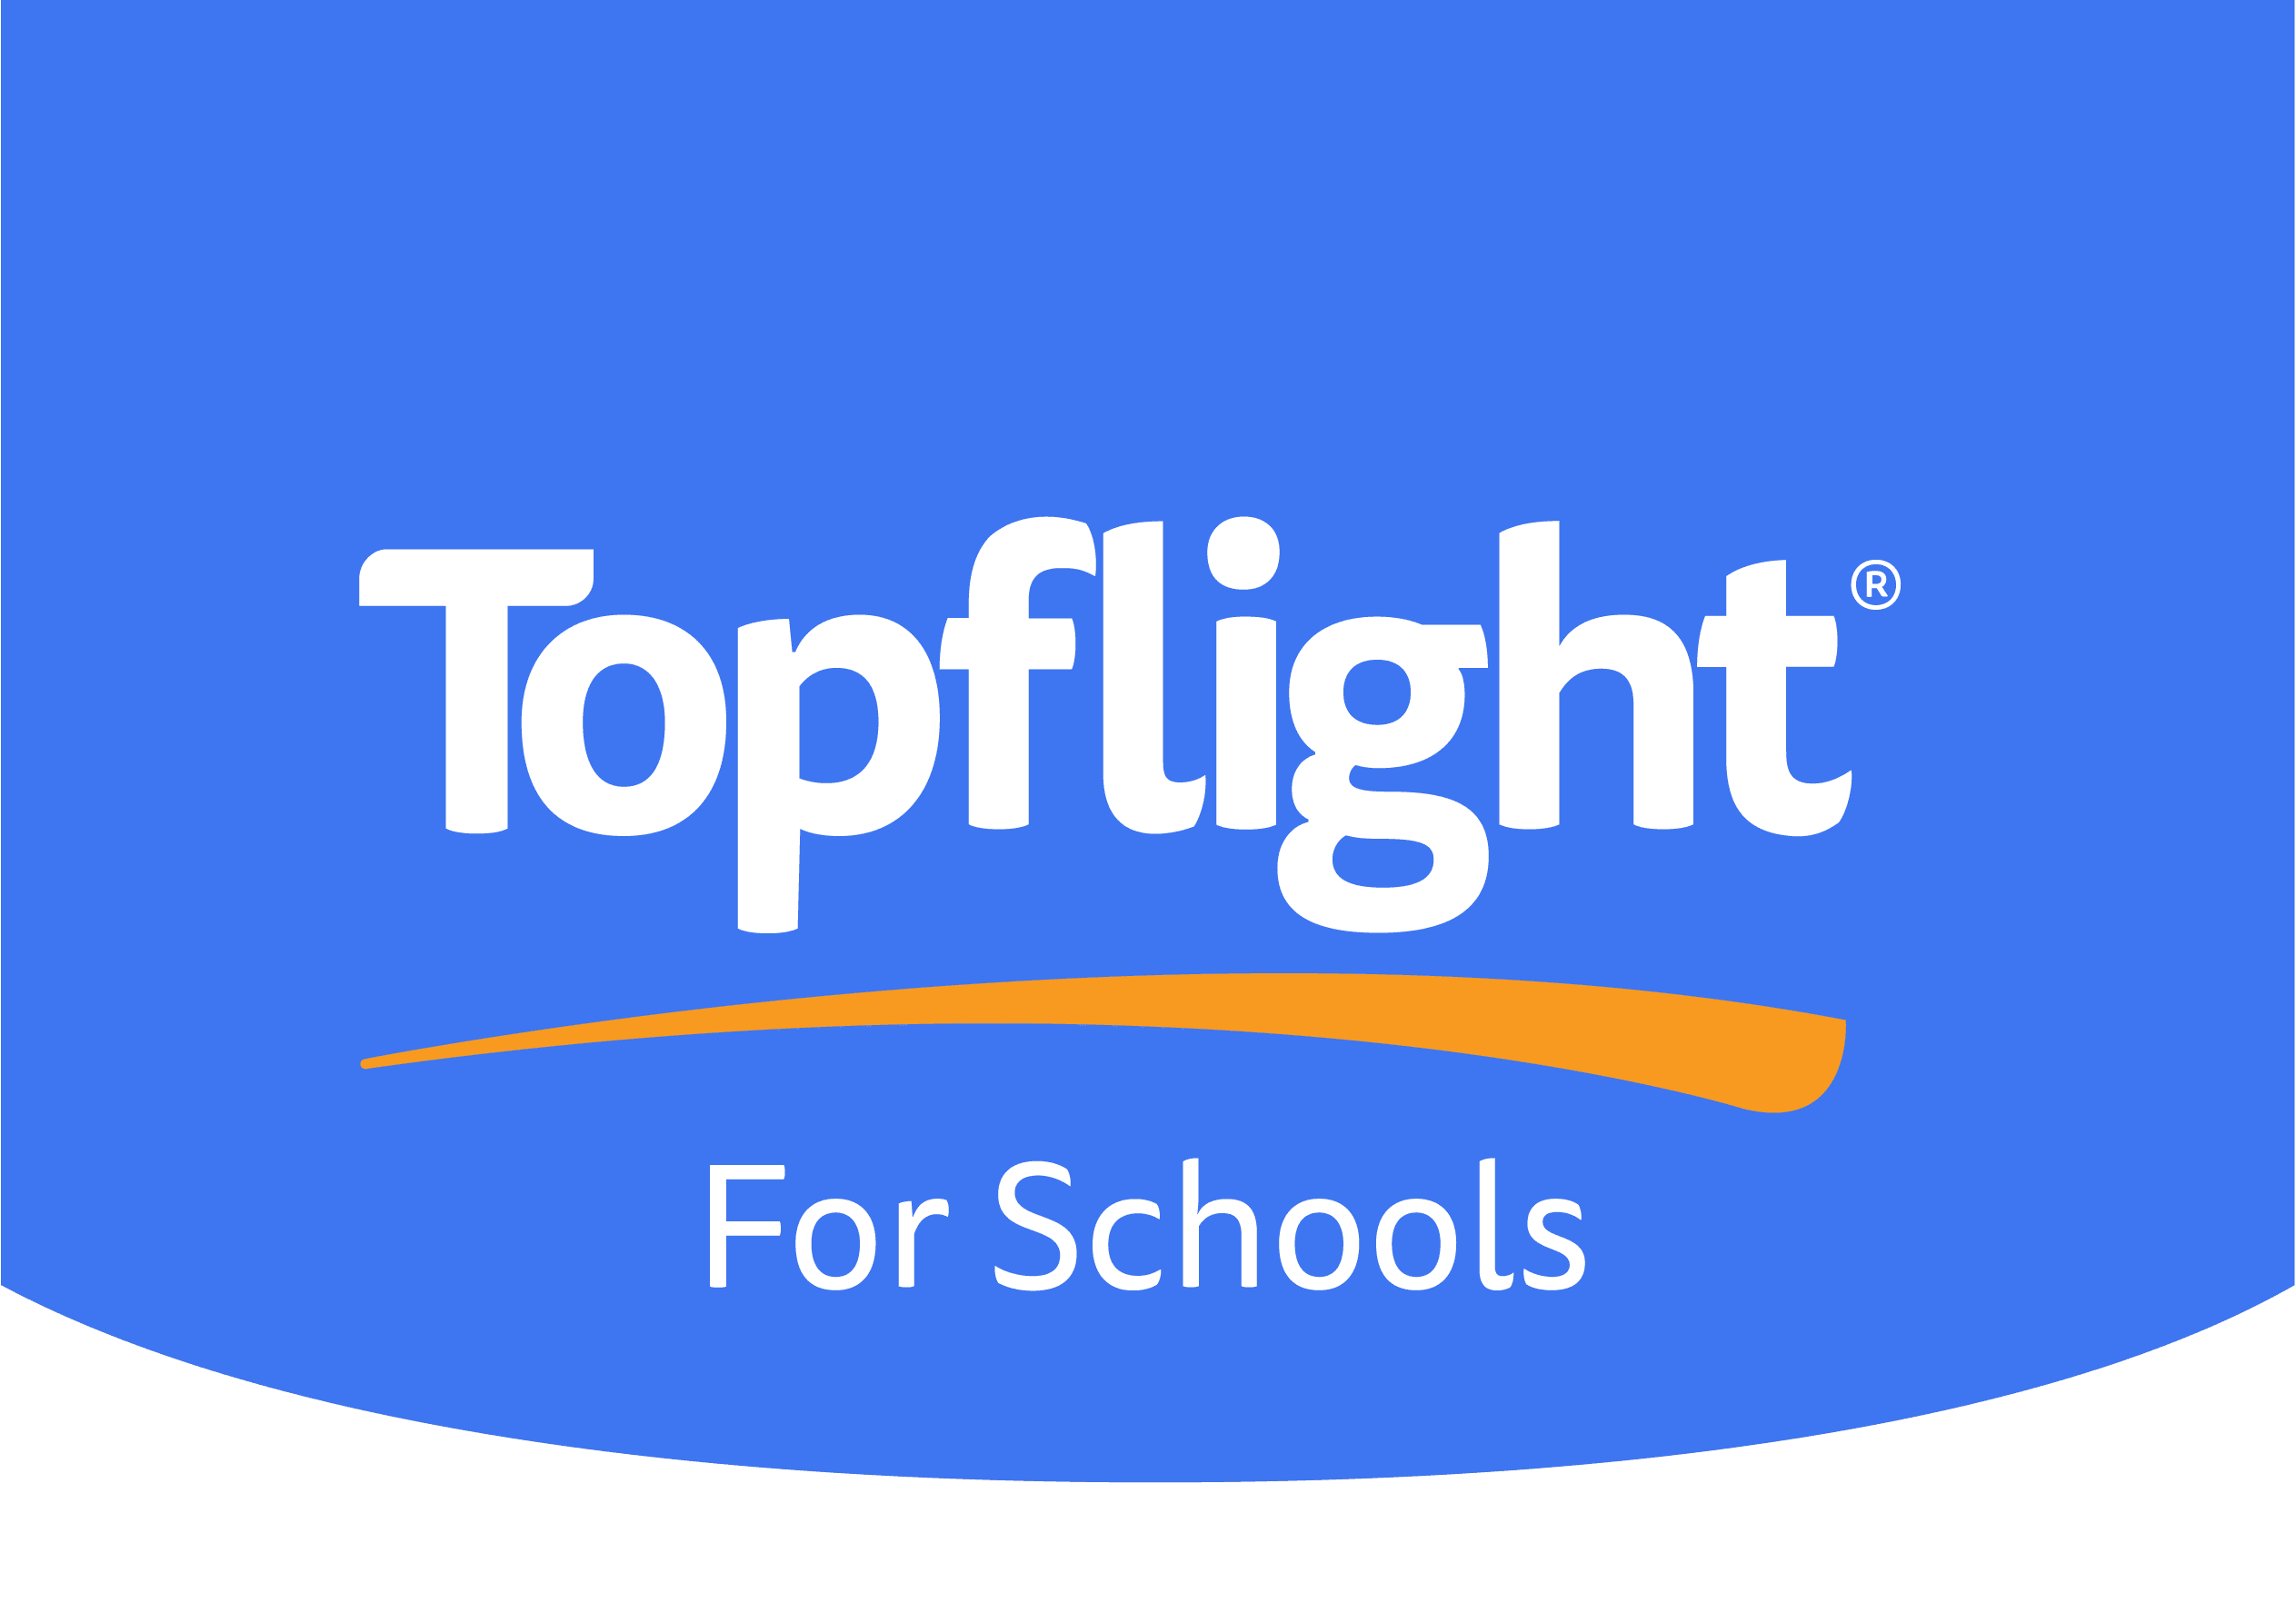 Topflight for Schools